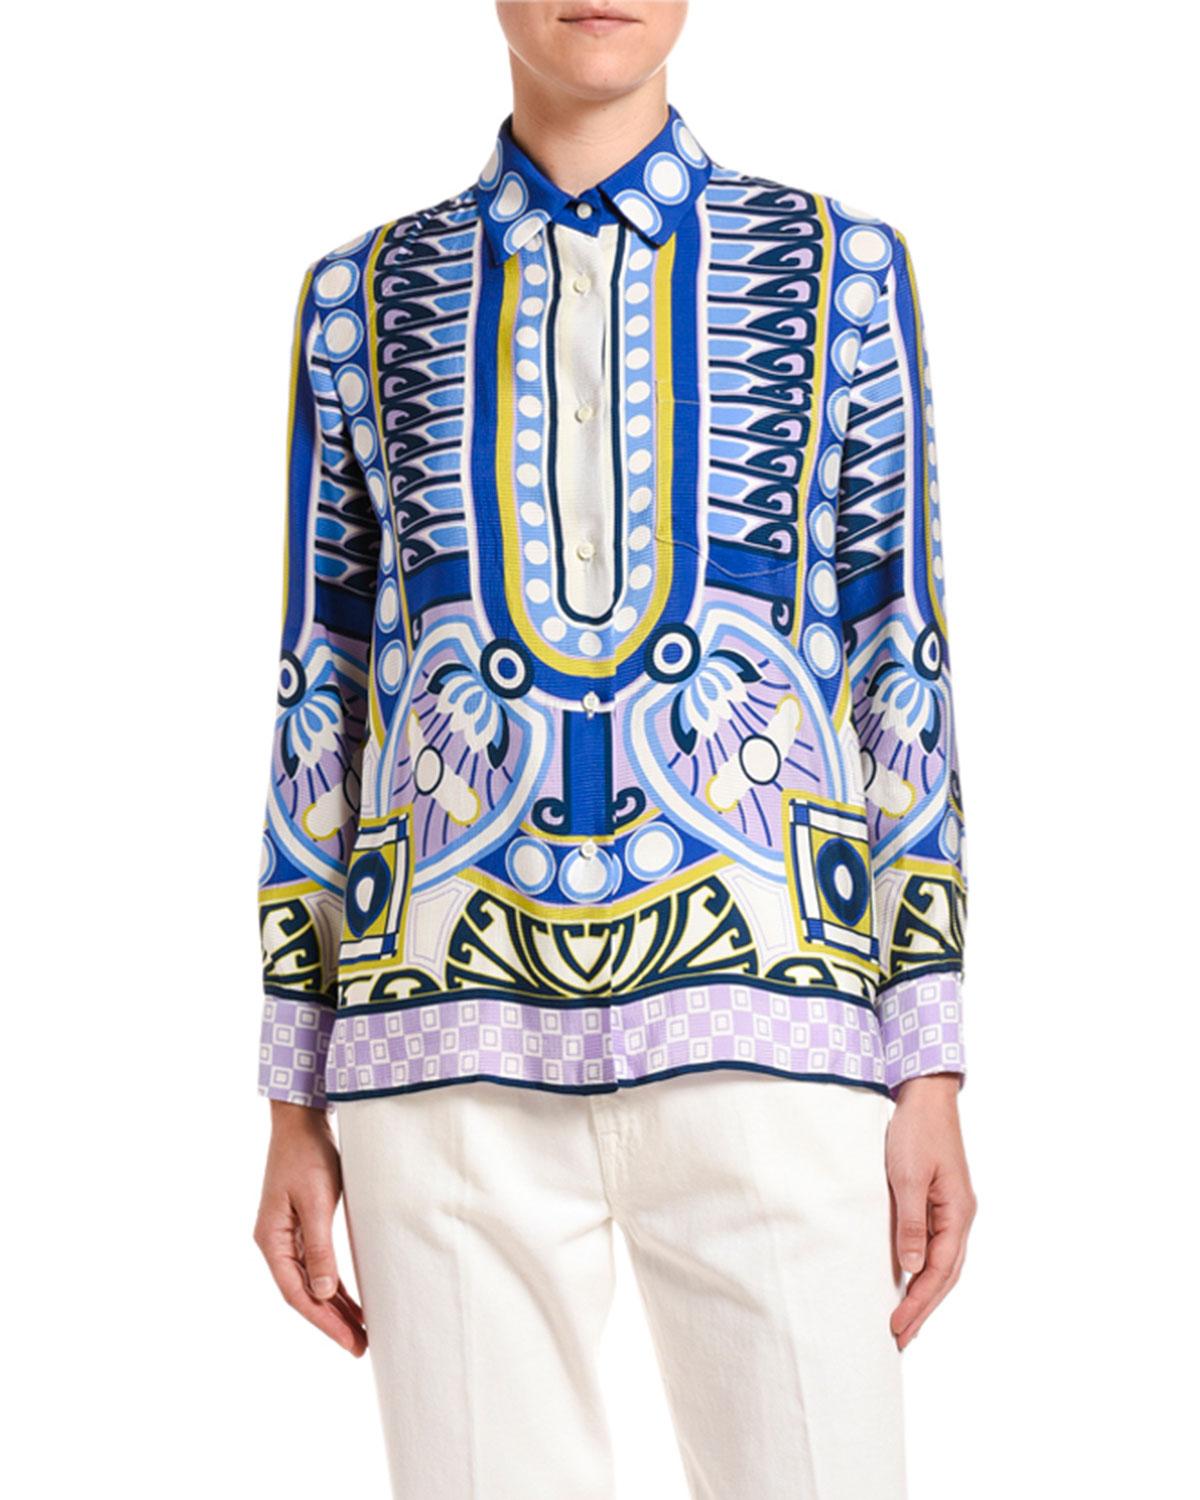 Abstract Print Sable Boy Shirt